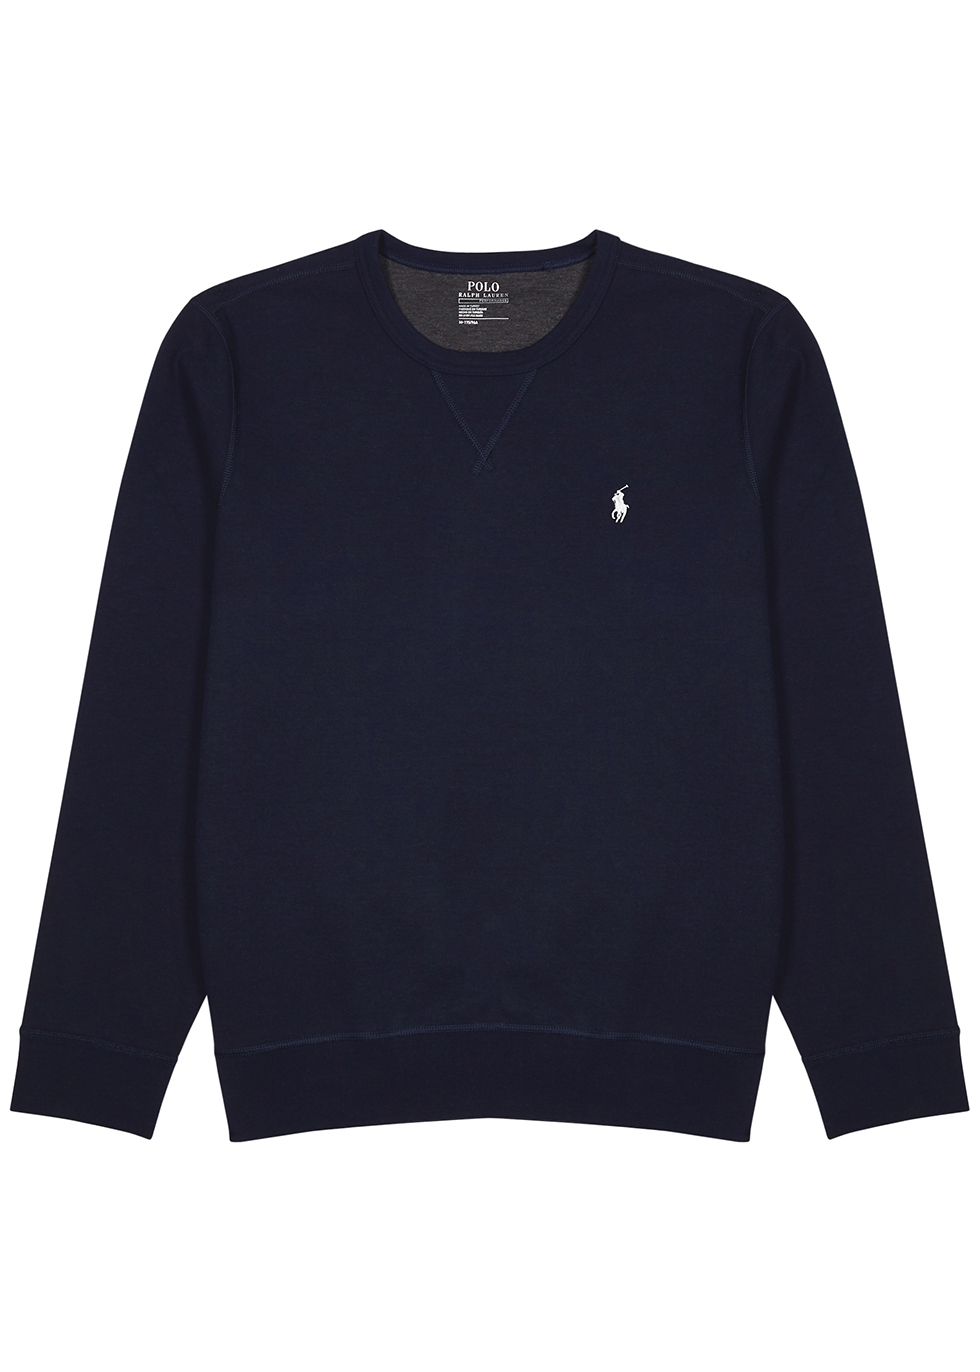 Performance navy jersey sweatshirt